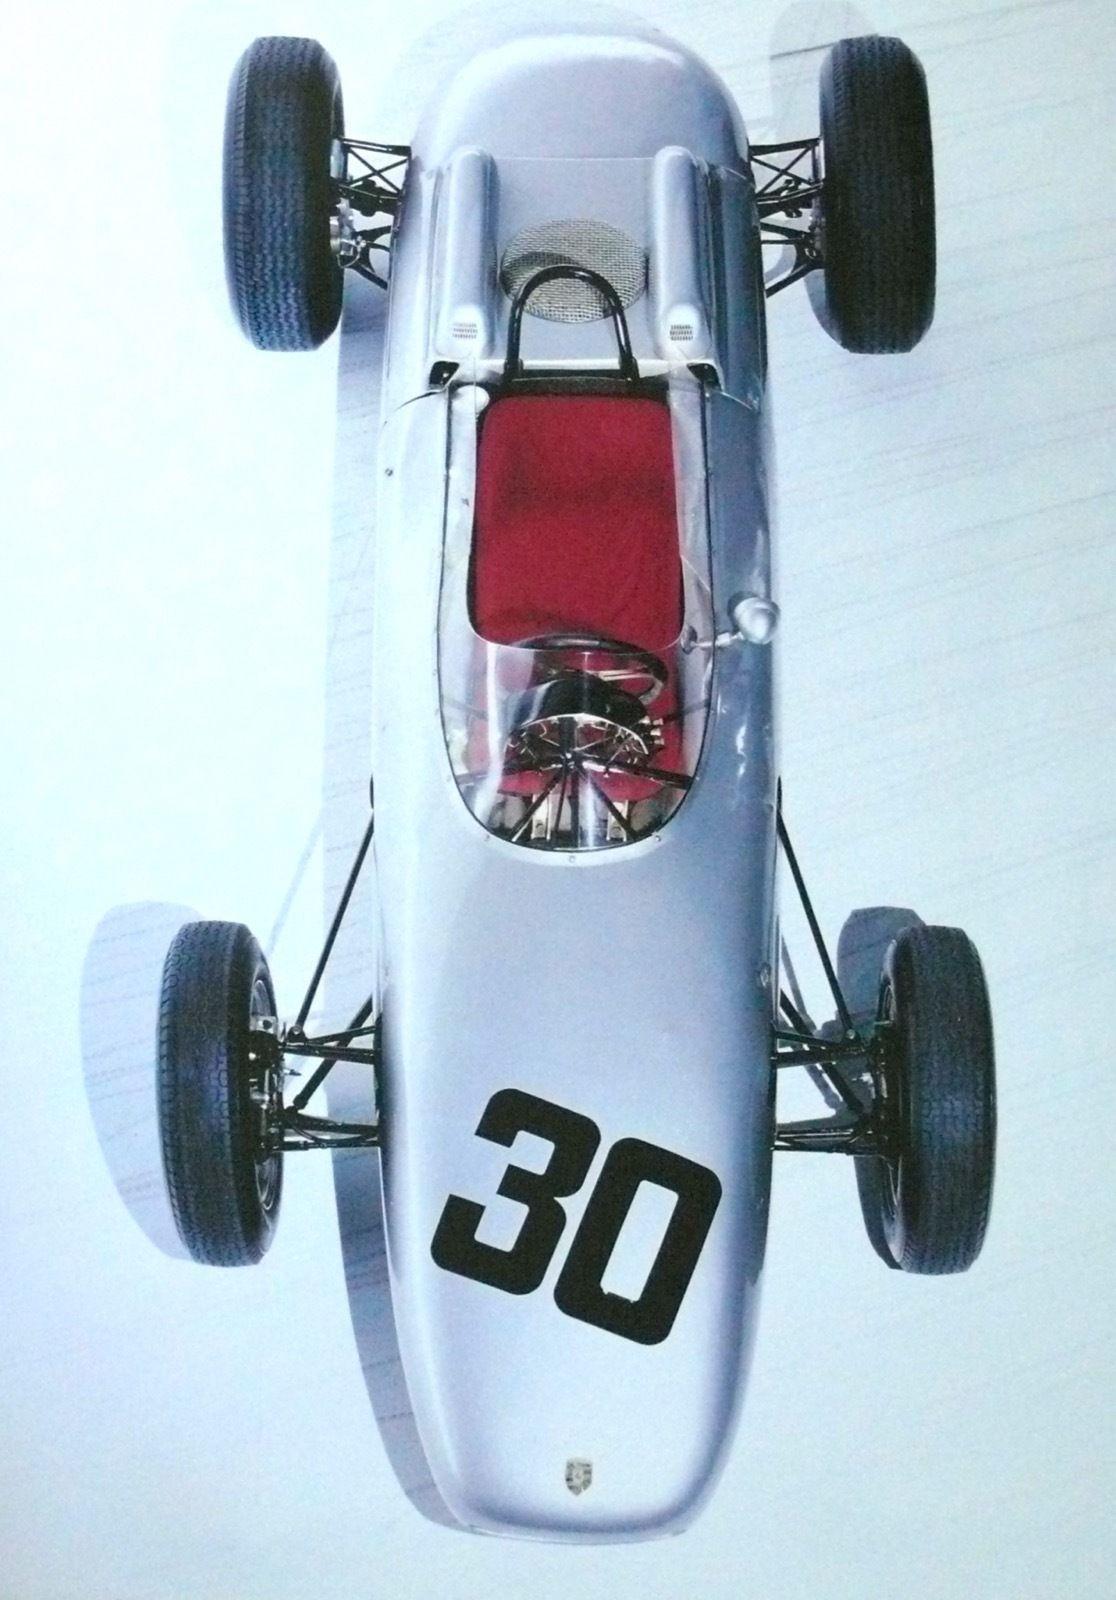 1962 Porsche 804 Formula 1 / Process / Vision